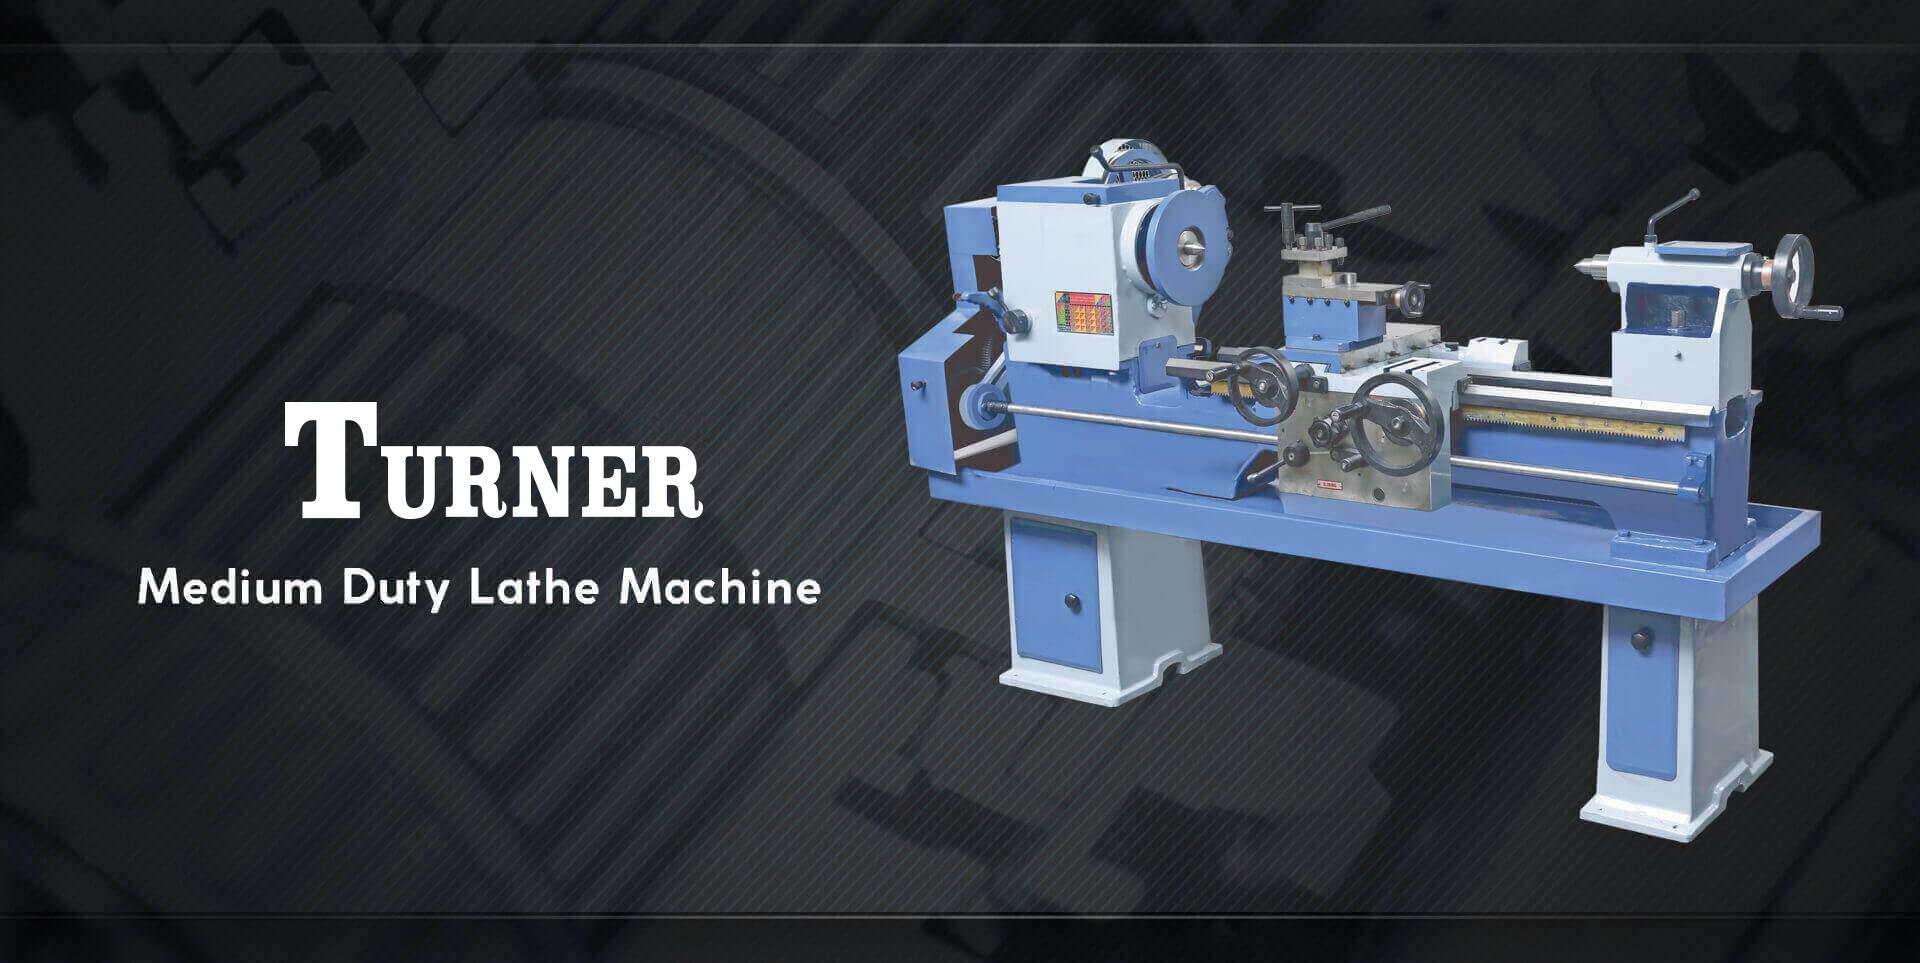 Medium Duty Lathe Machine Manufacturer | Macpower Industries